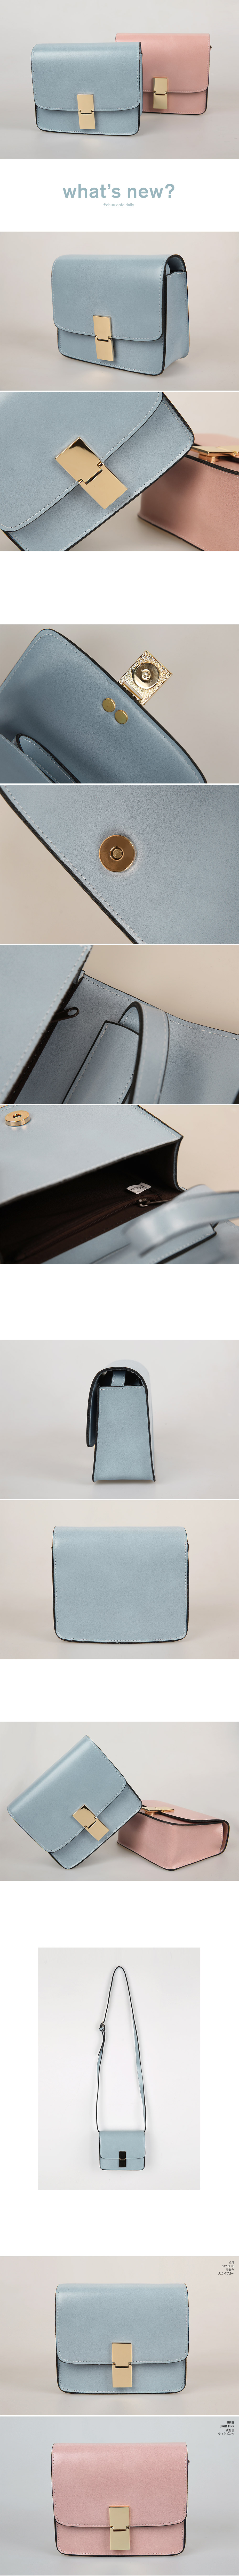 -sp-160129-bag-01.jpg